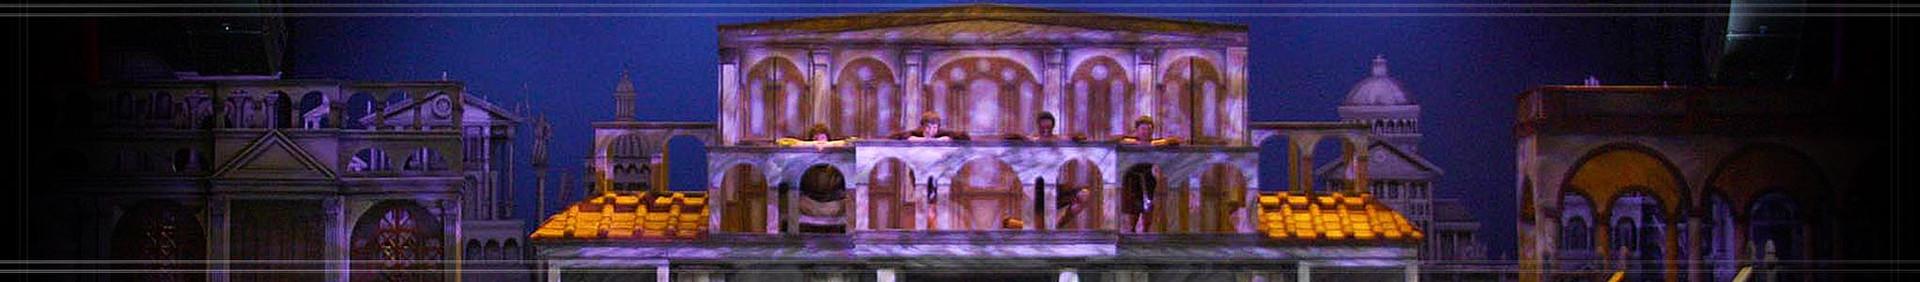 2.Musicals and Operas 2.jpg